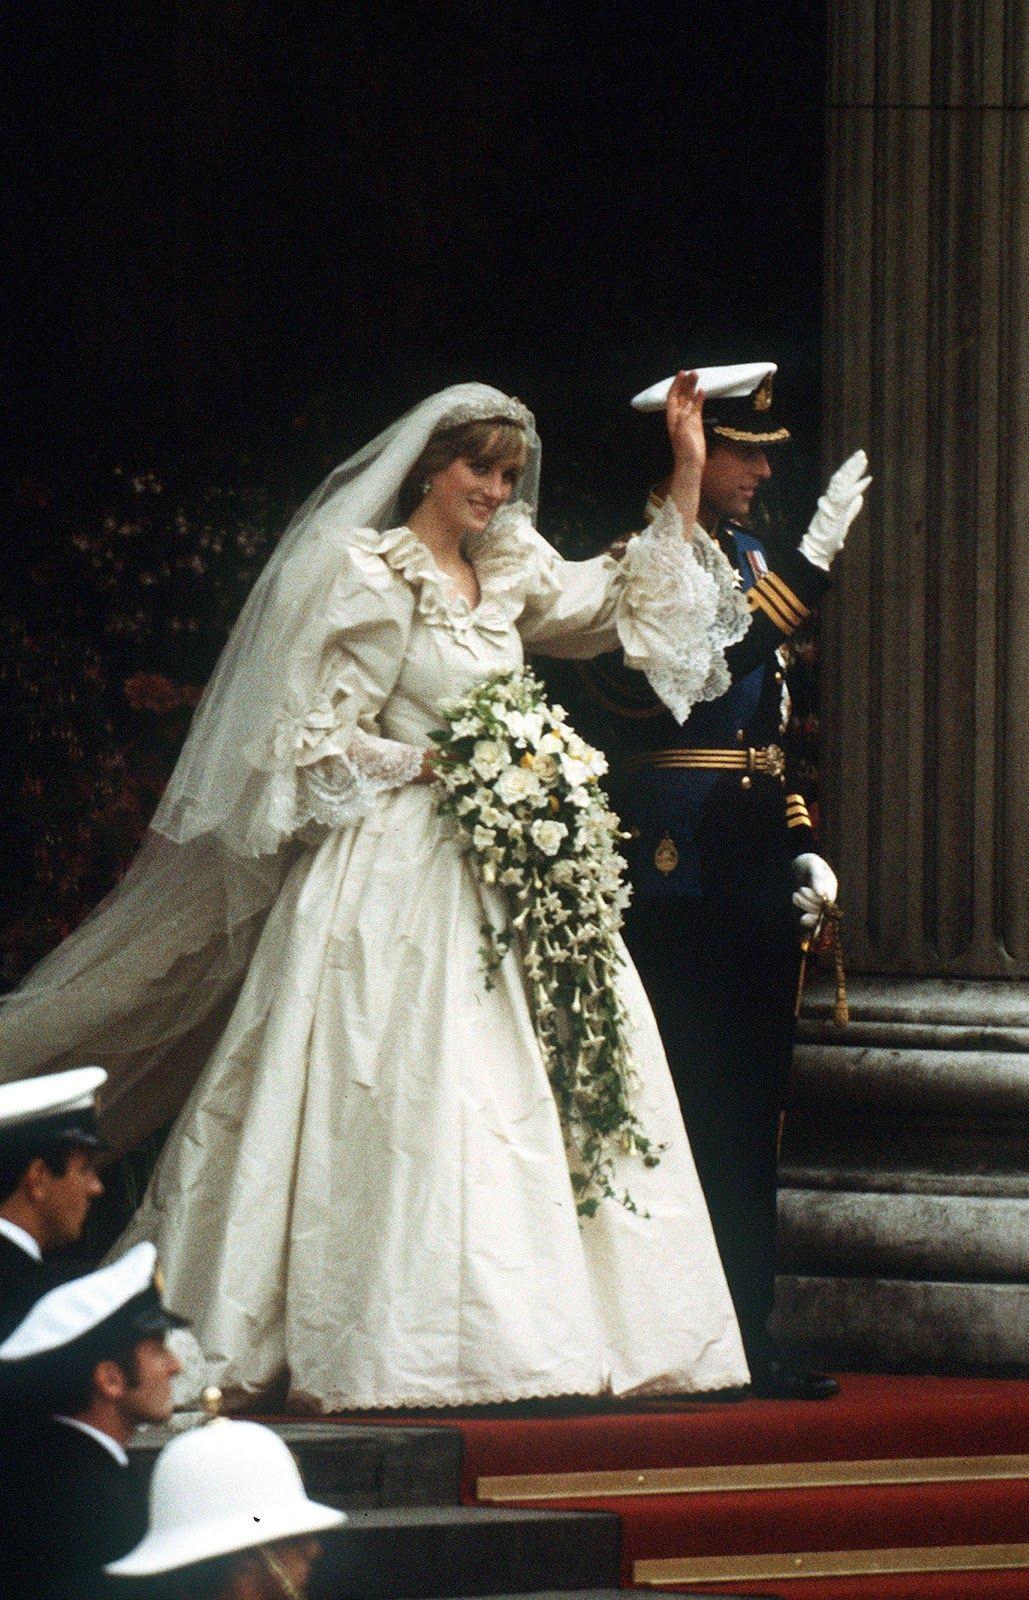 Bride5 Jpg 1 029 1 600 Pixels Princess Diana Wedding Princess Diana Wedding Dress Diana Wedding Dress [ jpg ]